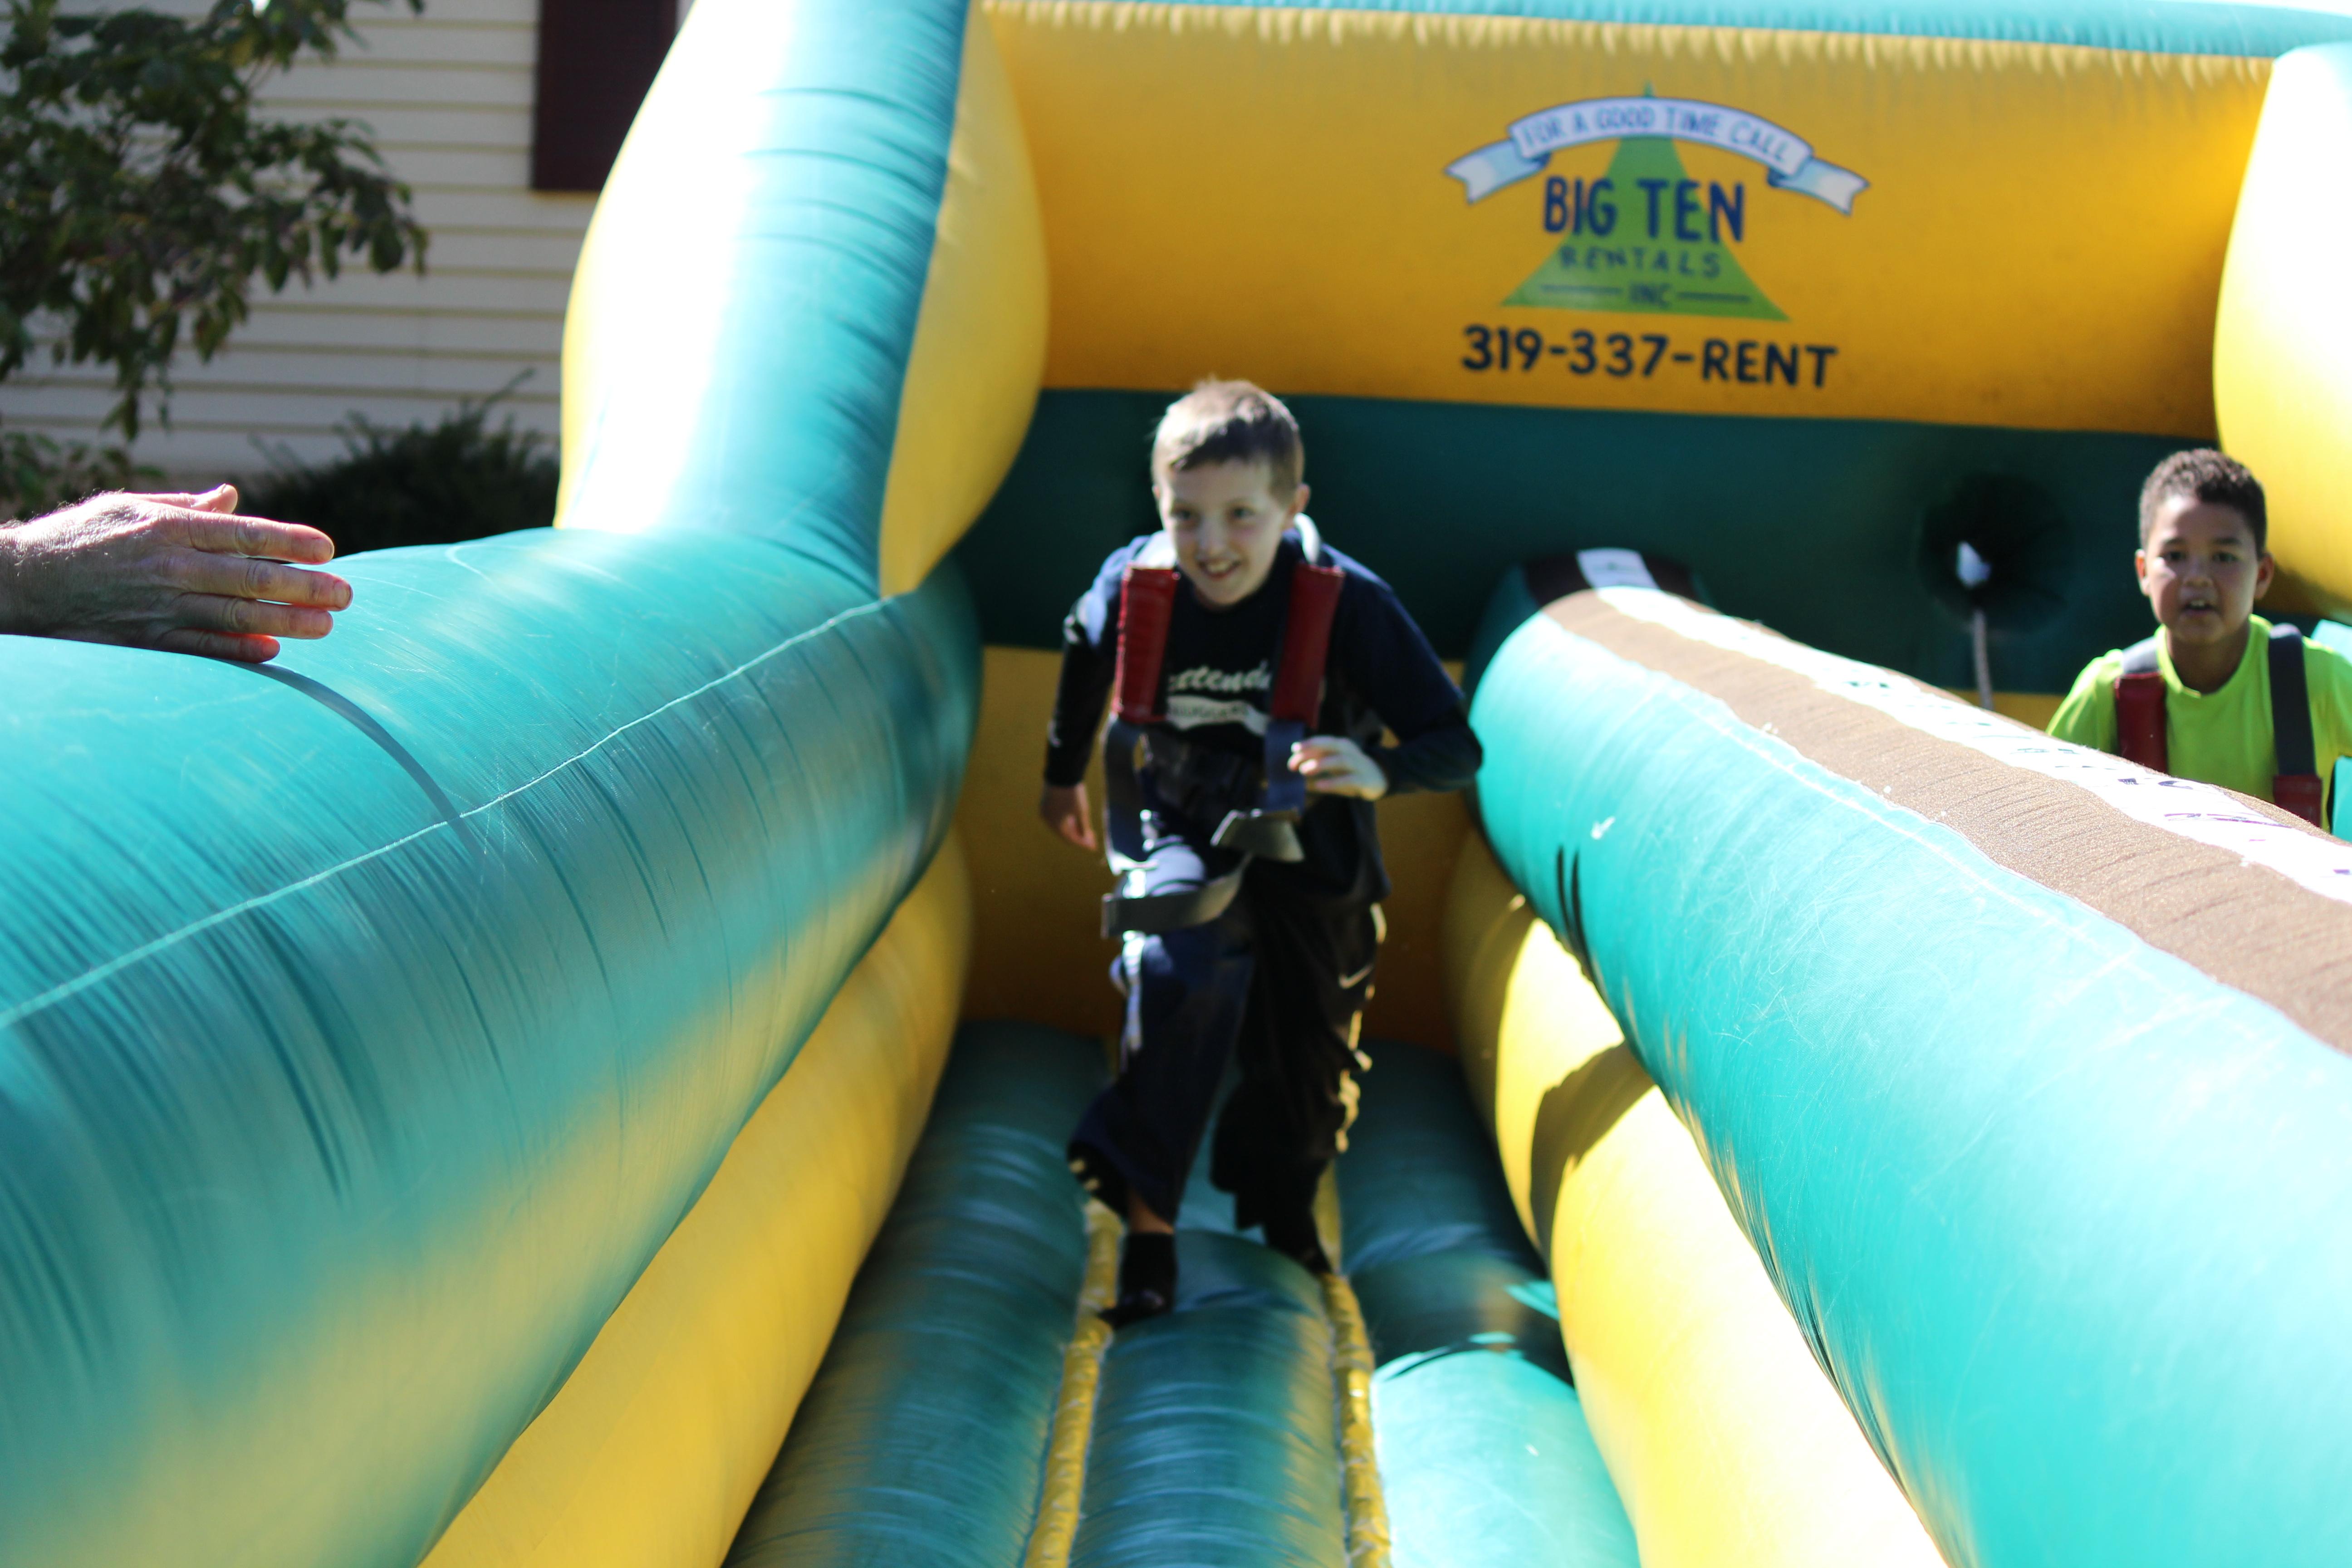 Bungee Run Challenge Inflatable Rental Iowa City Cedar